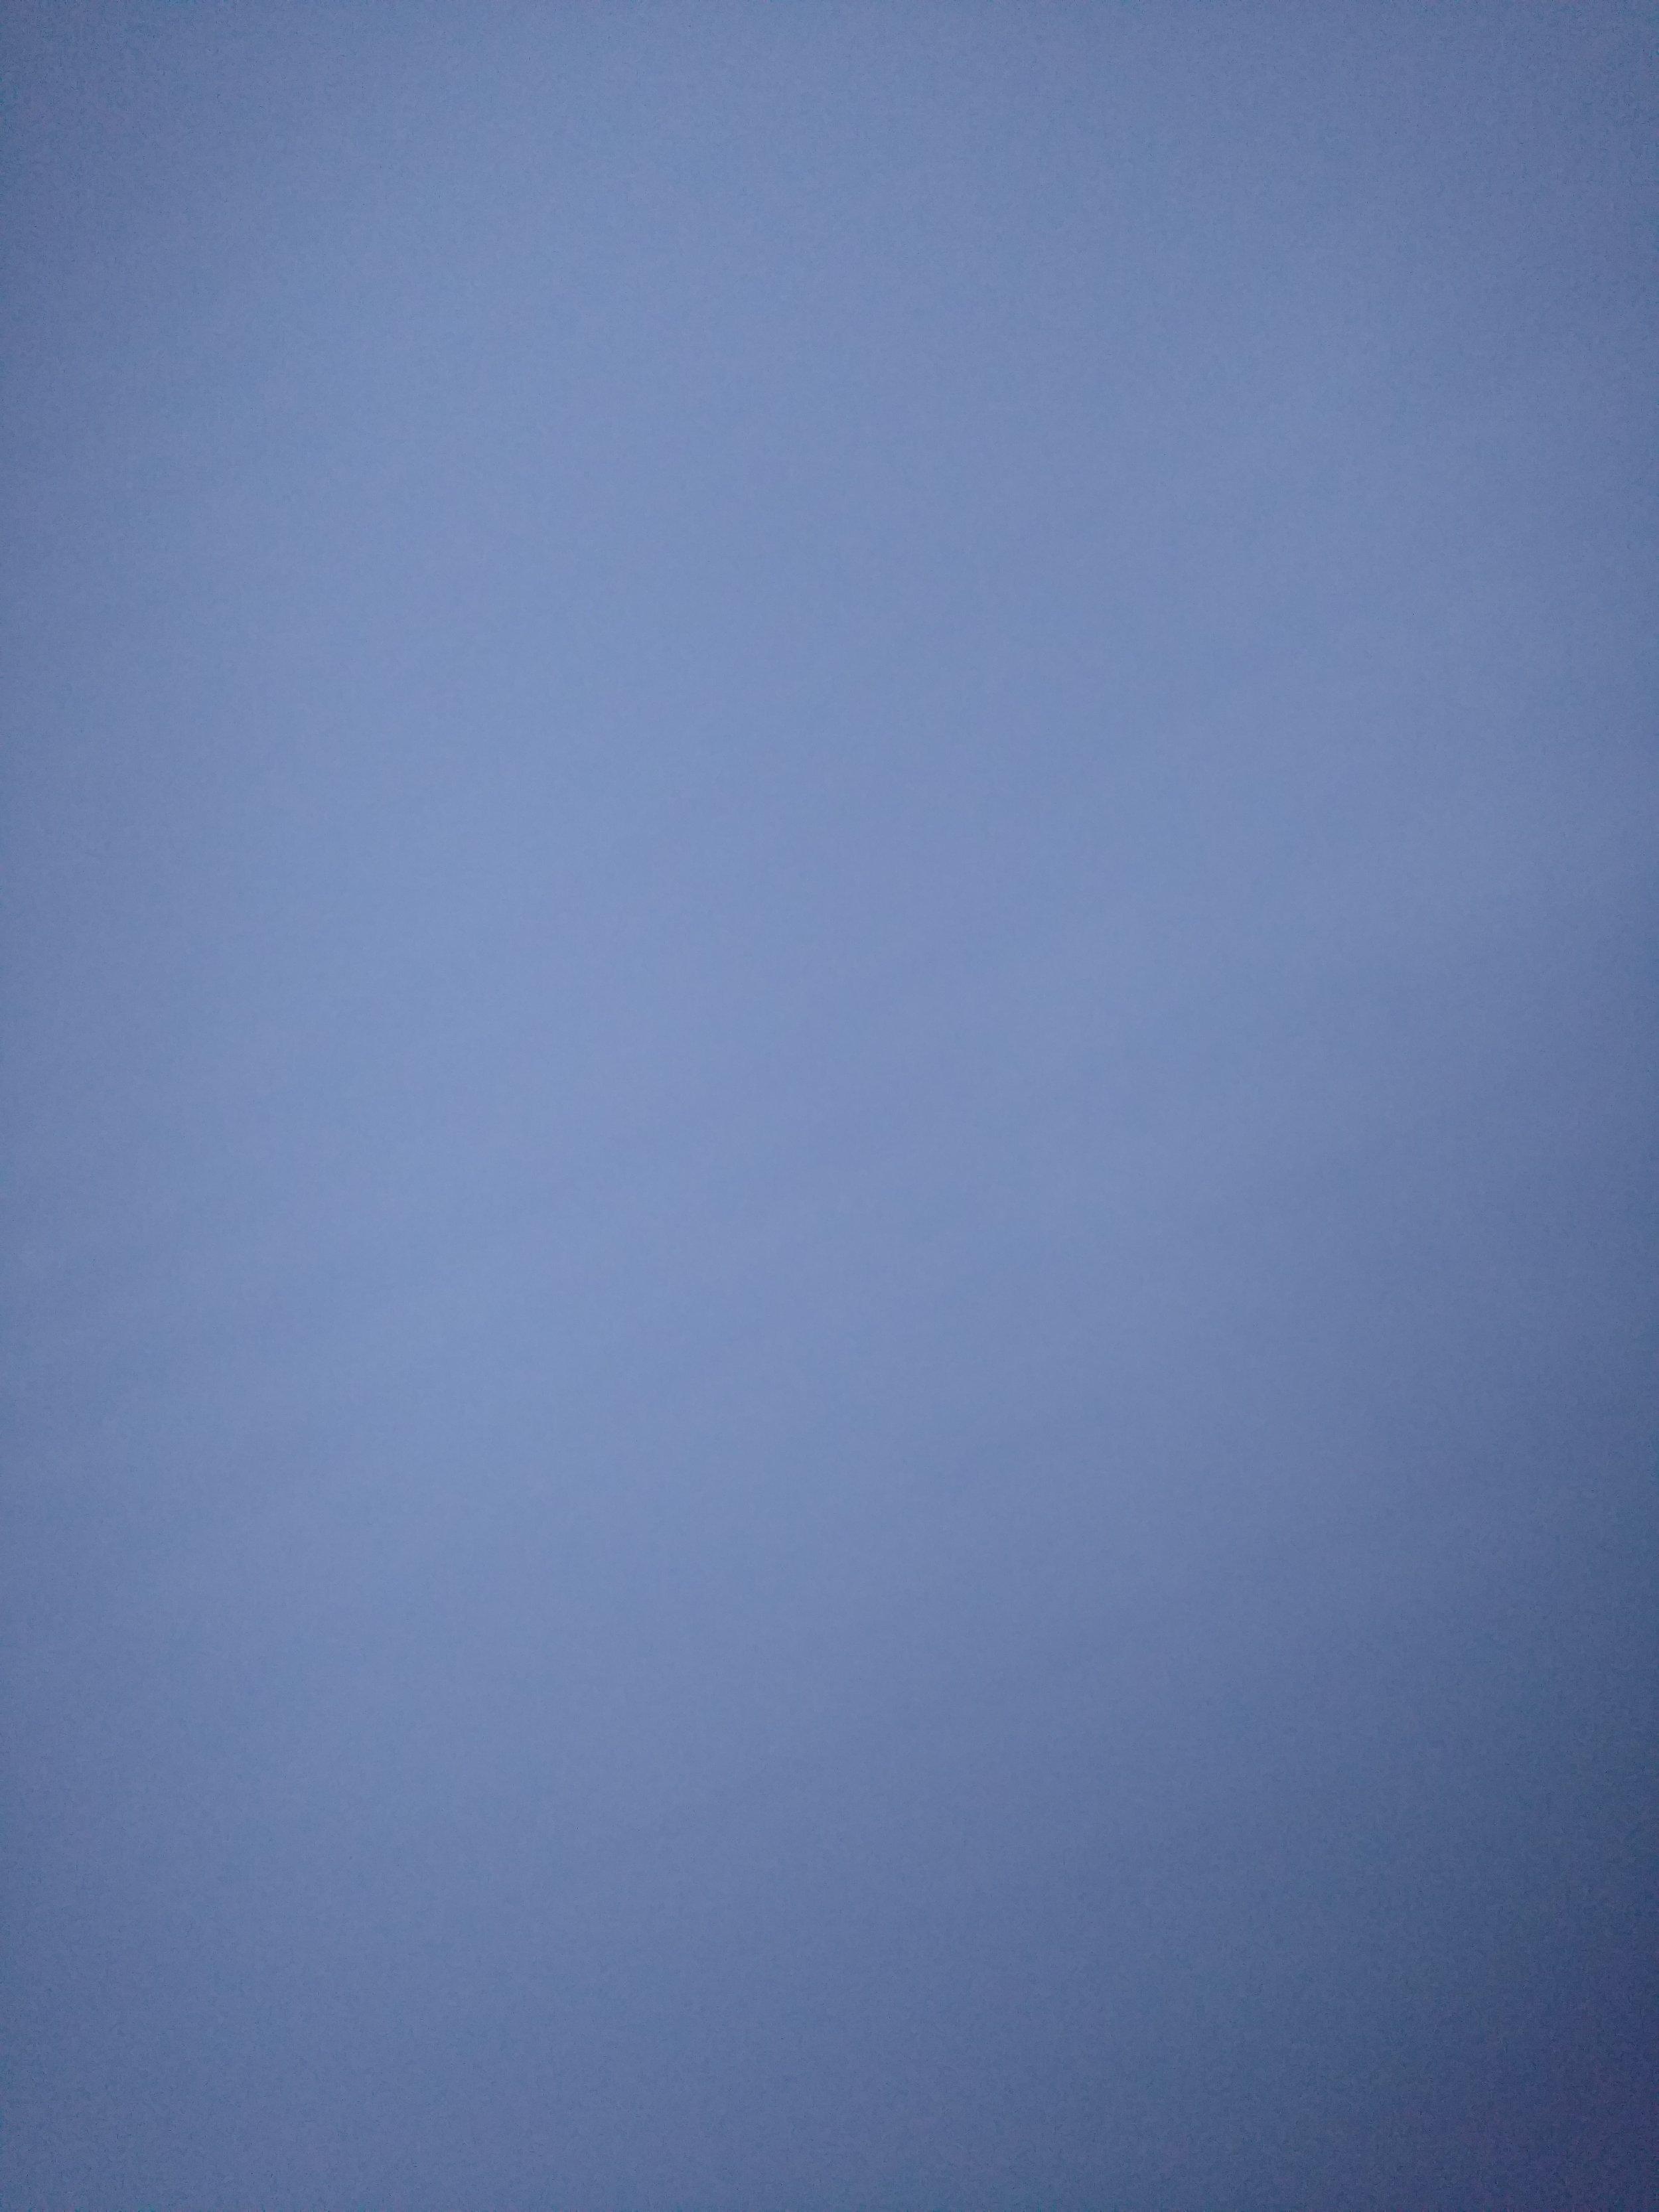 willroth-co-free-texture-gradient-009.jpg